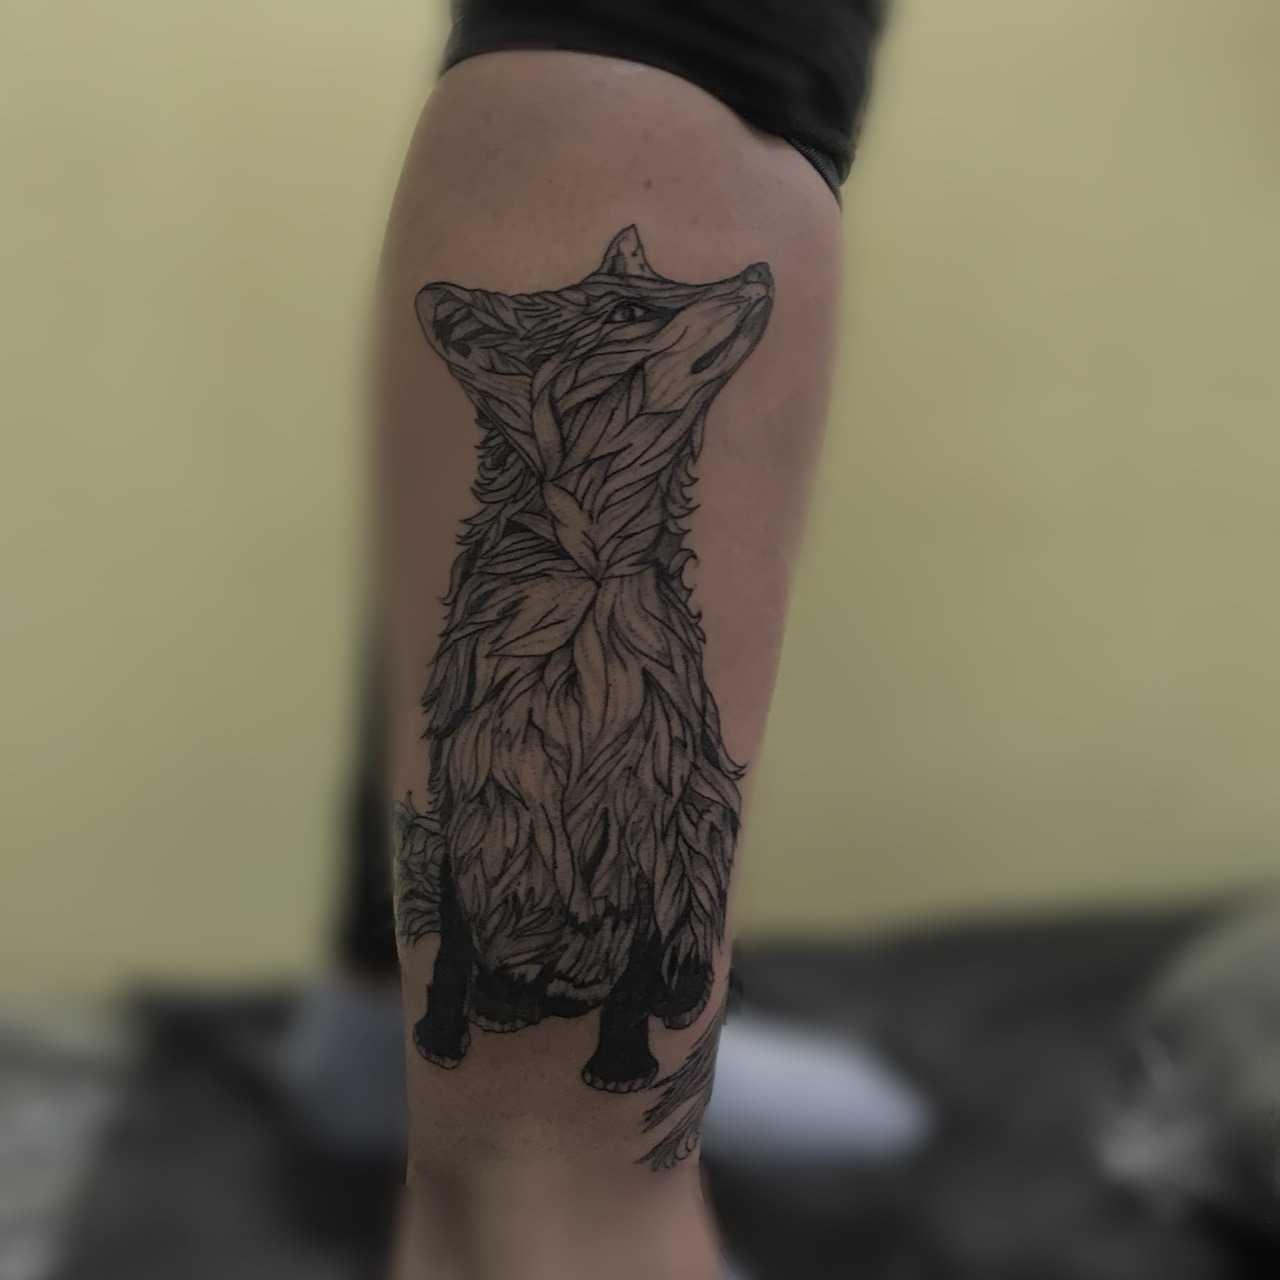 Leafy fox tattoo